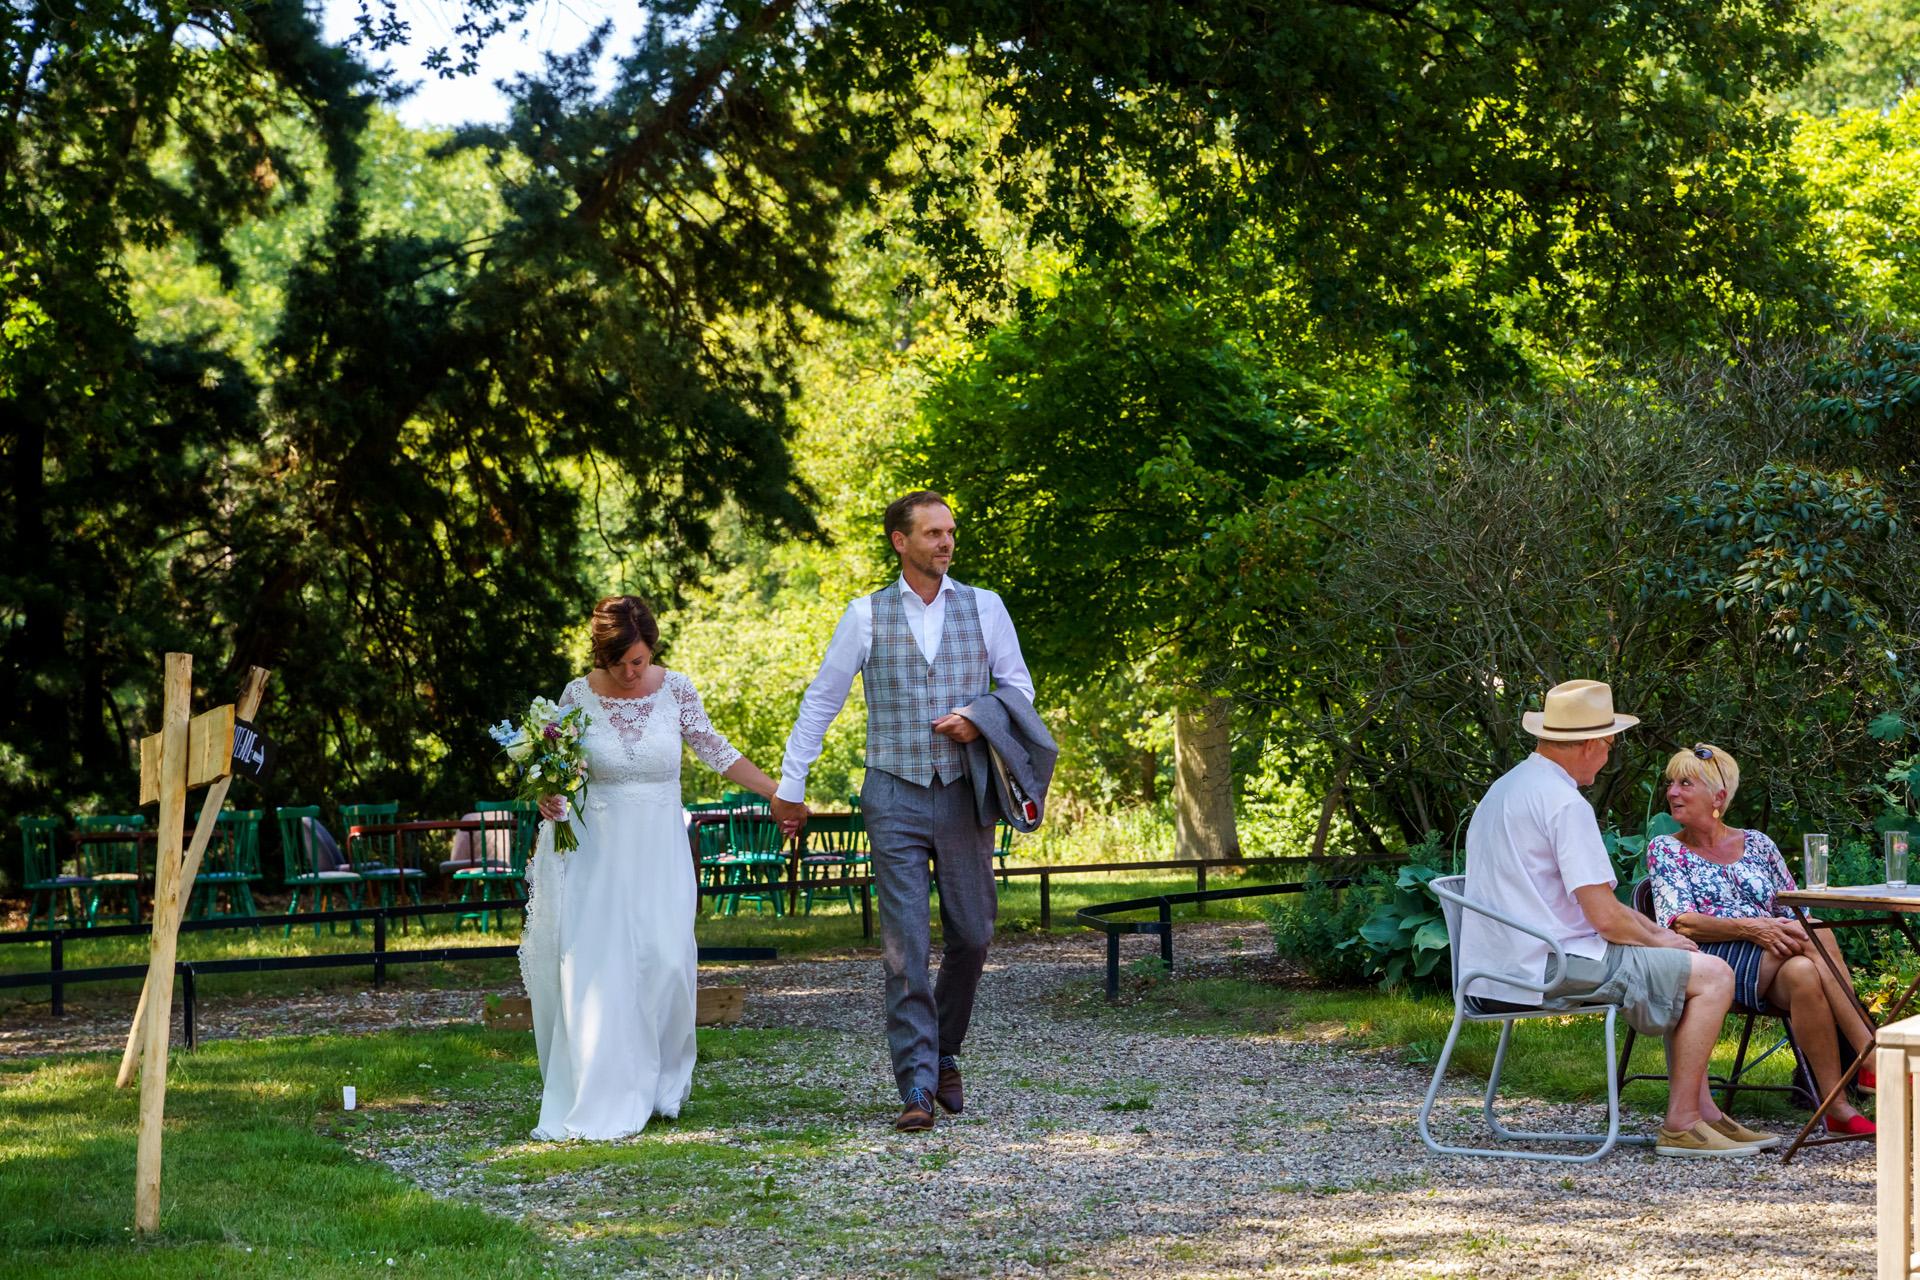 Deventer Outdoor Elopement Ceremony Image | The couple arrives hand-in-hand